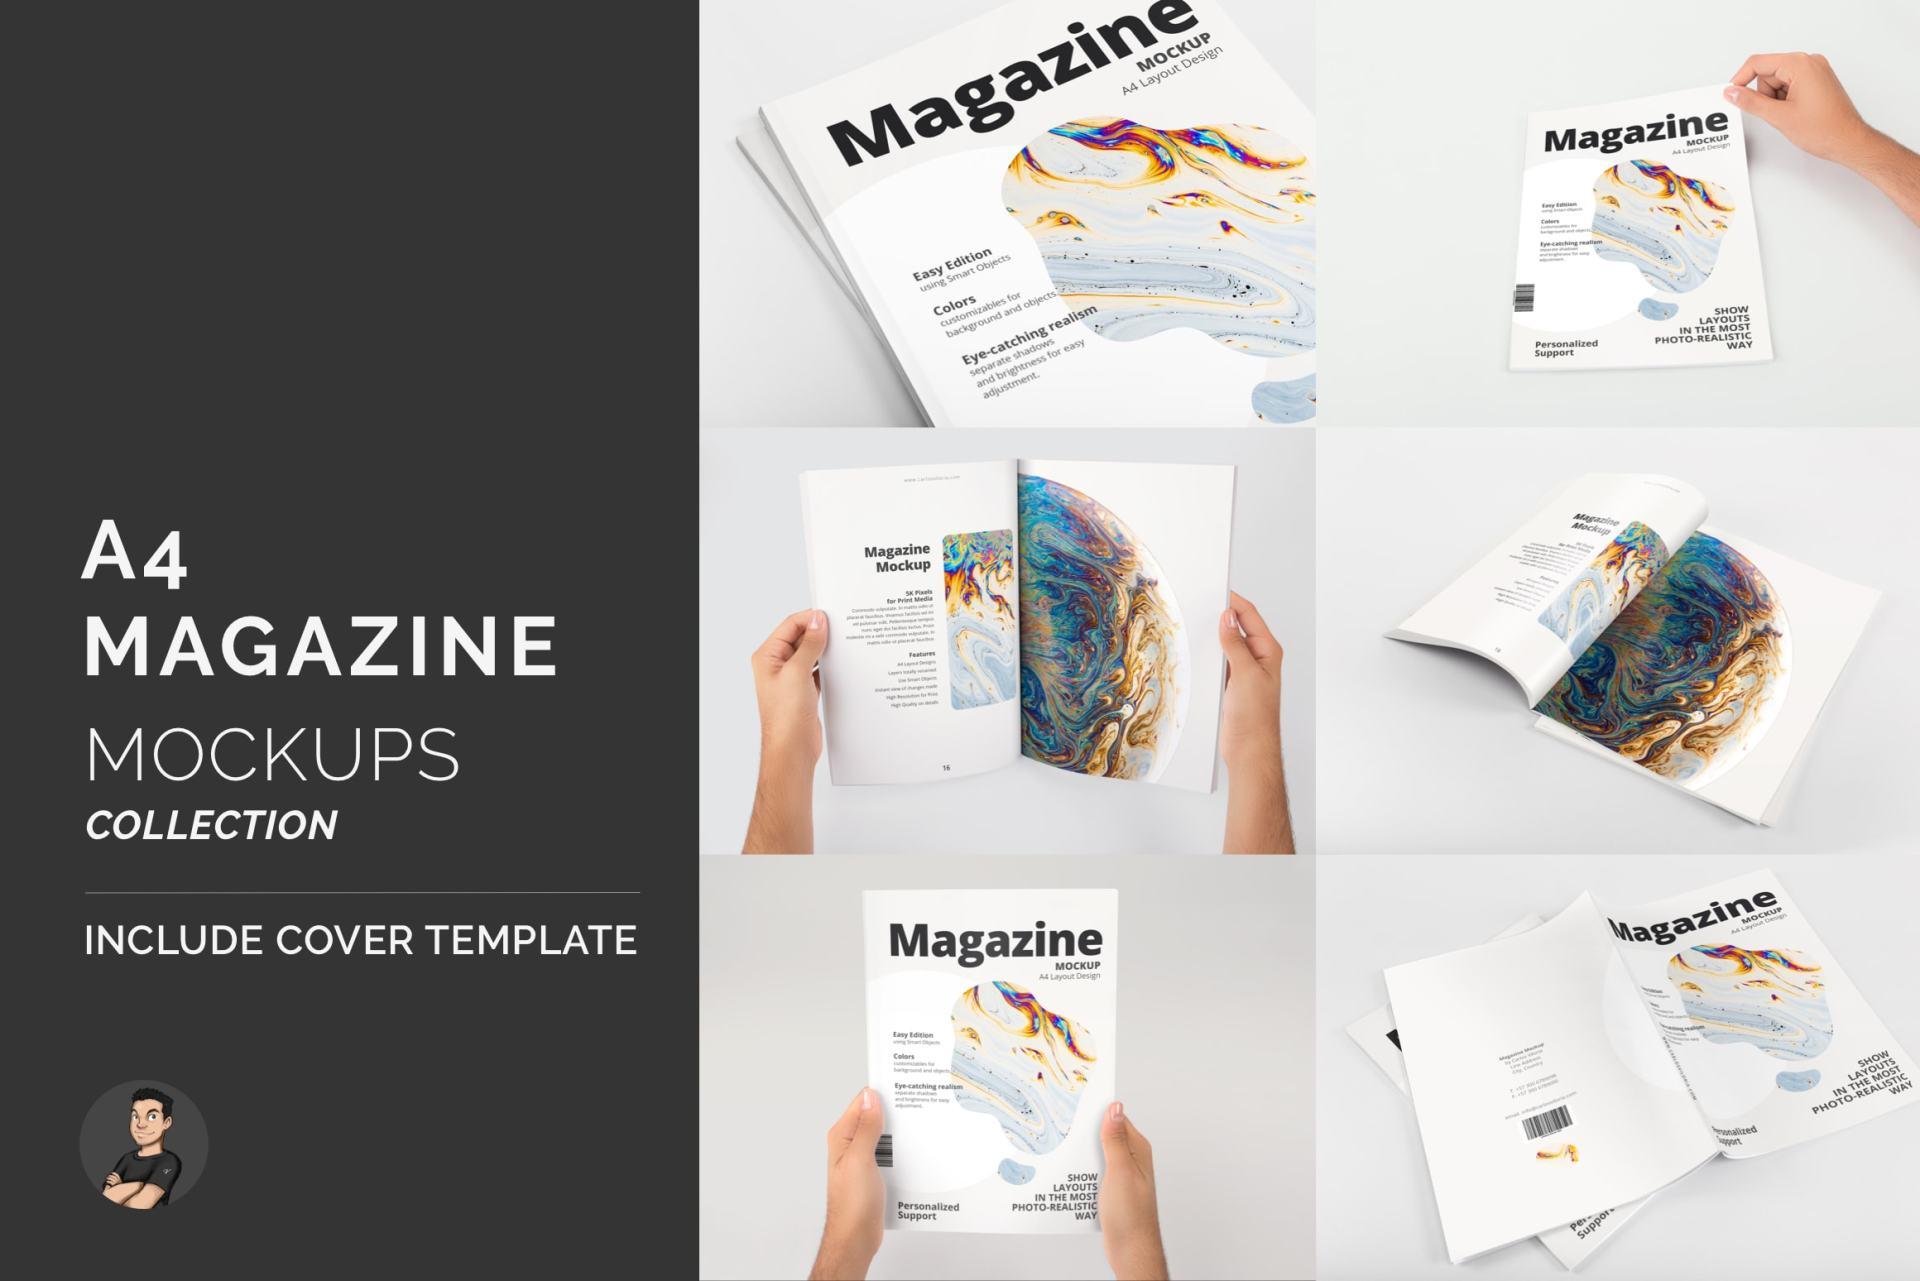 A4 Magazine Mockups Pack